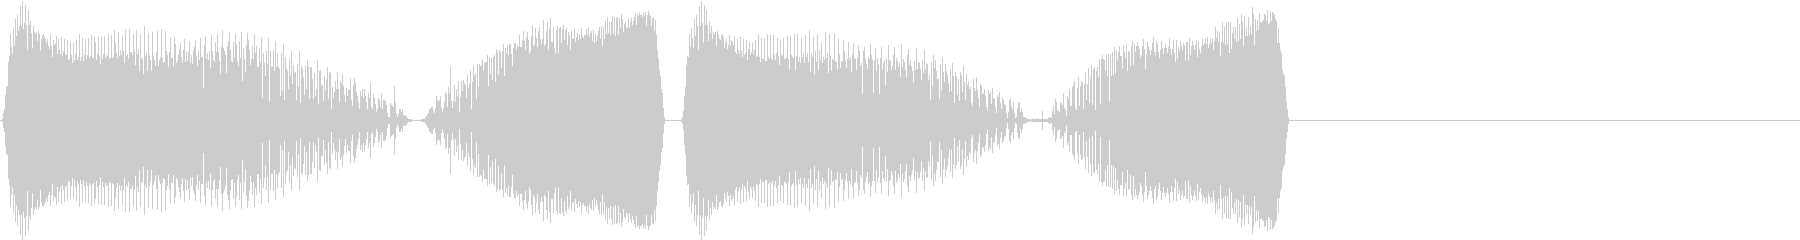 DJプレイ スクラッチ・ノイズ 15の未再生の波形